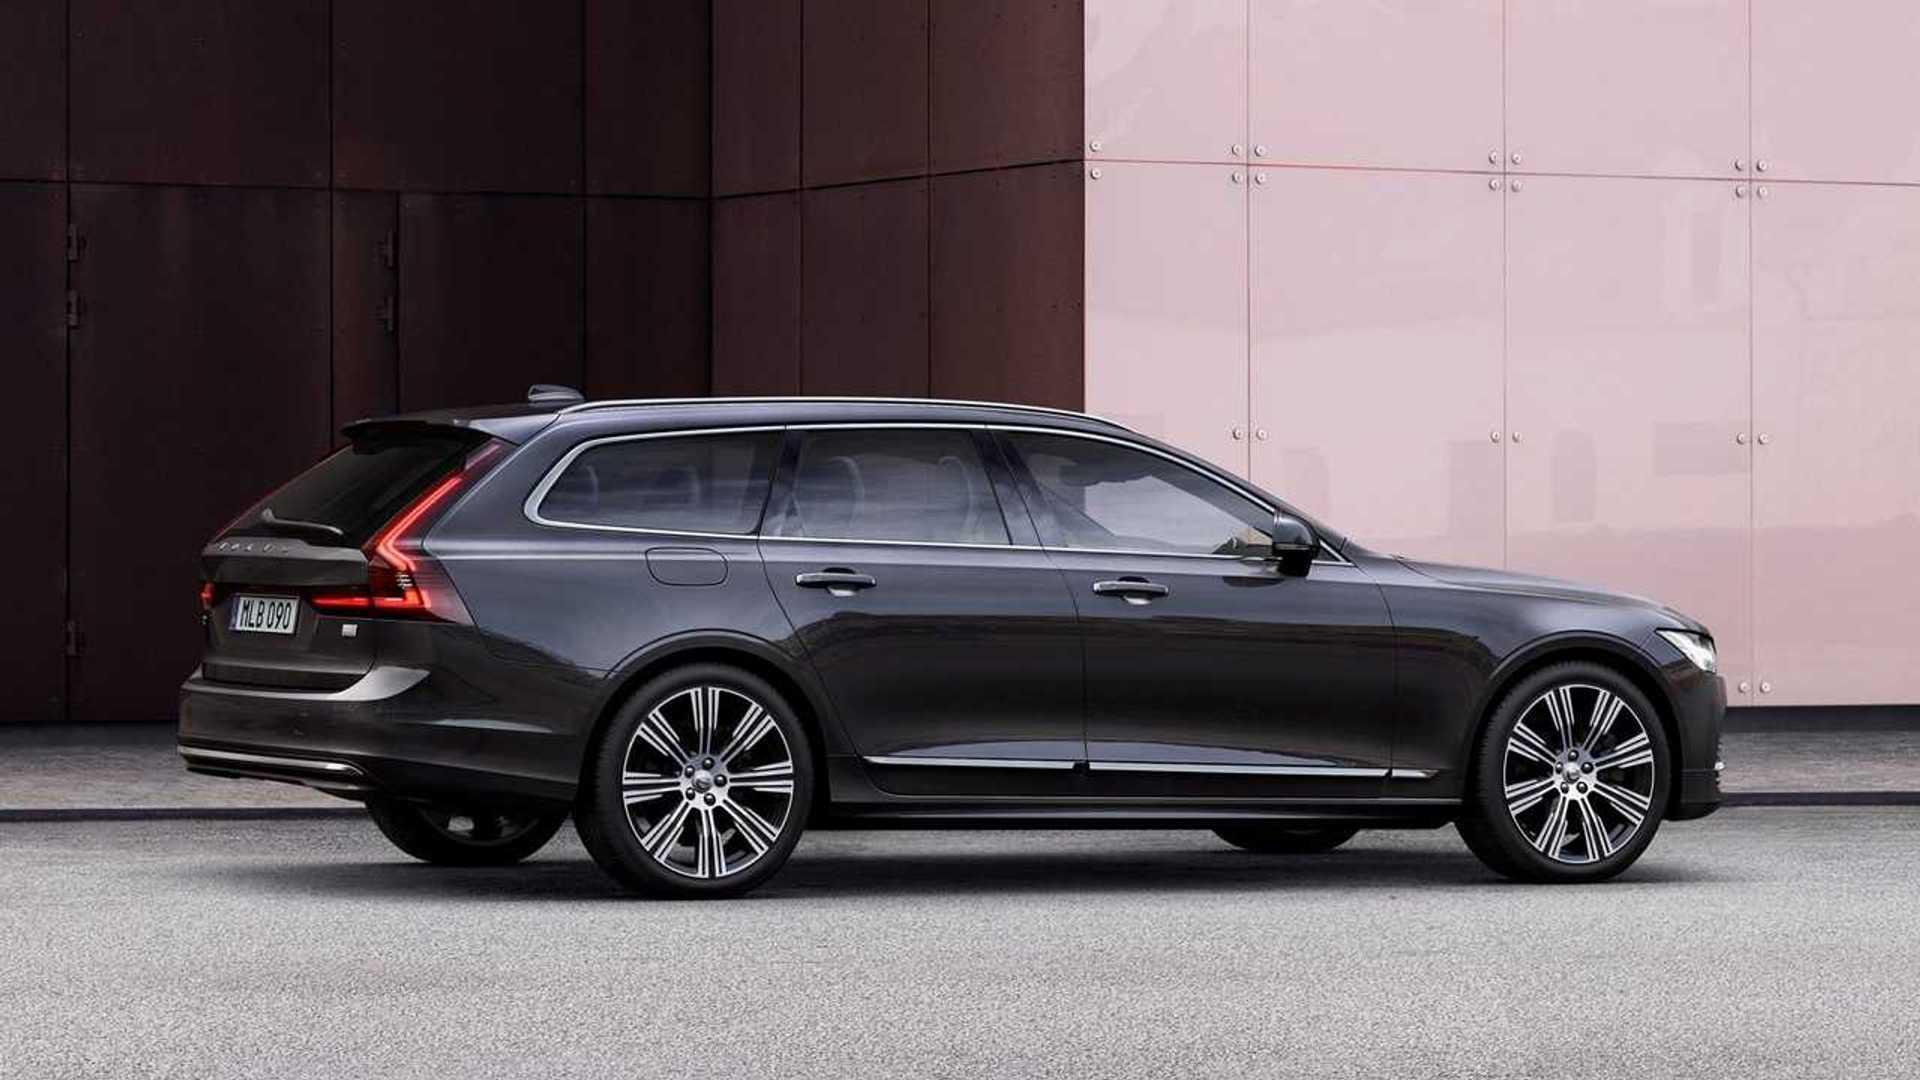 2020 Volvo V90 Configurations